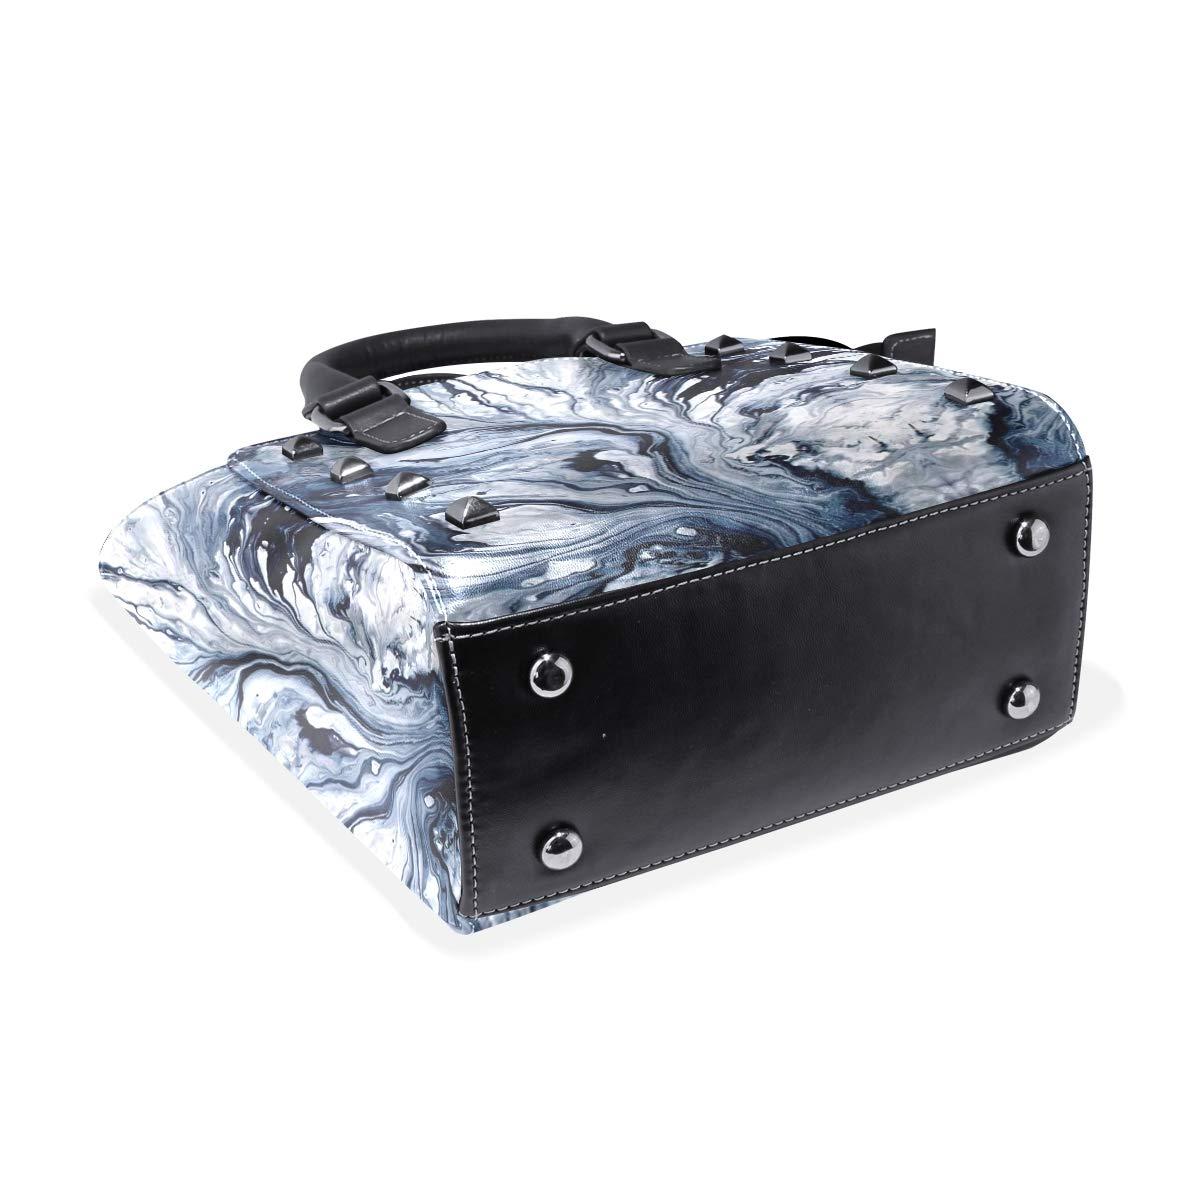 Water Abstract Marble Womens Classy Satchel Handbag Handbag With shoulder Strap Crossbody Bag